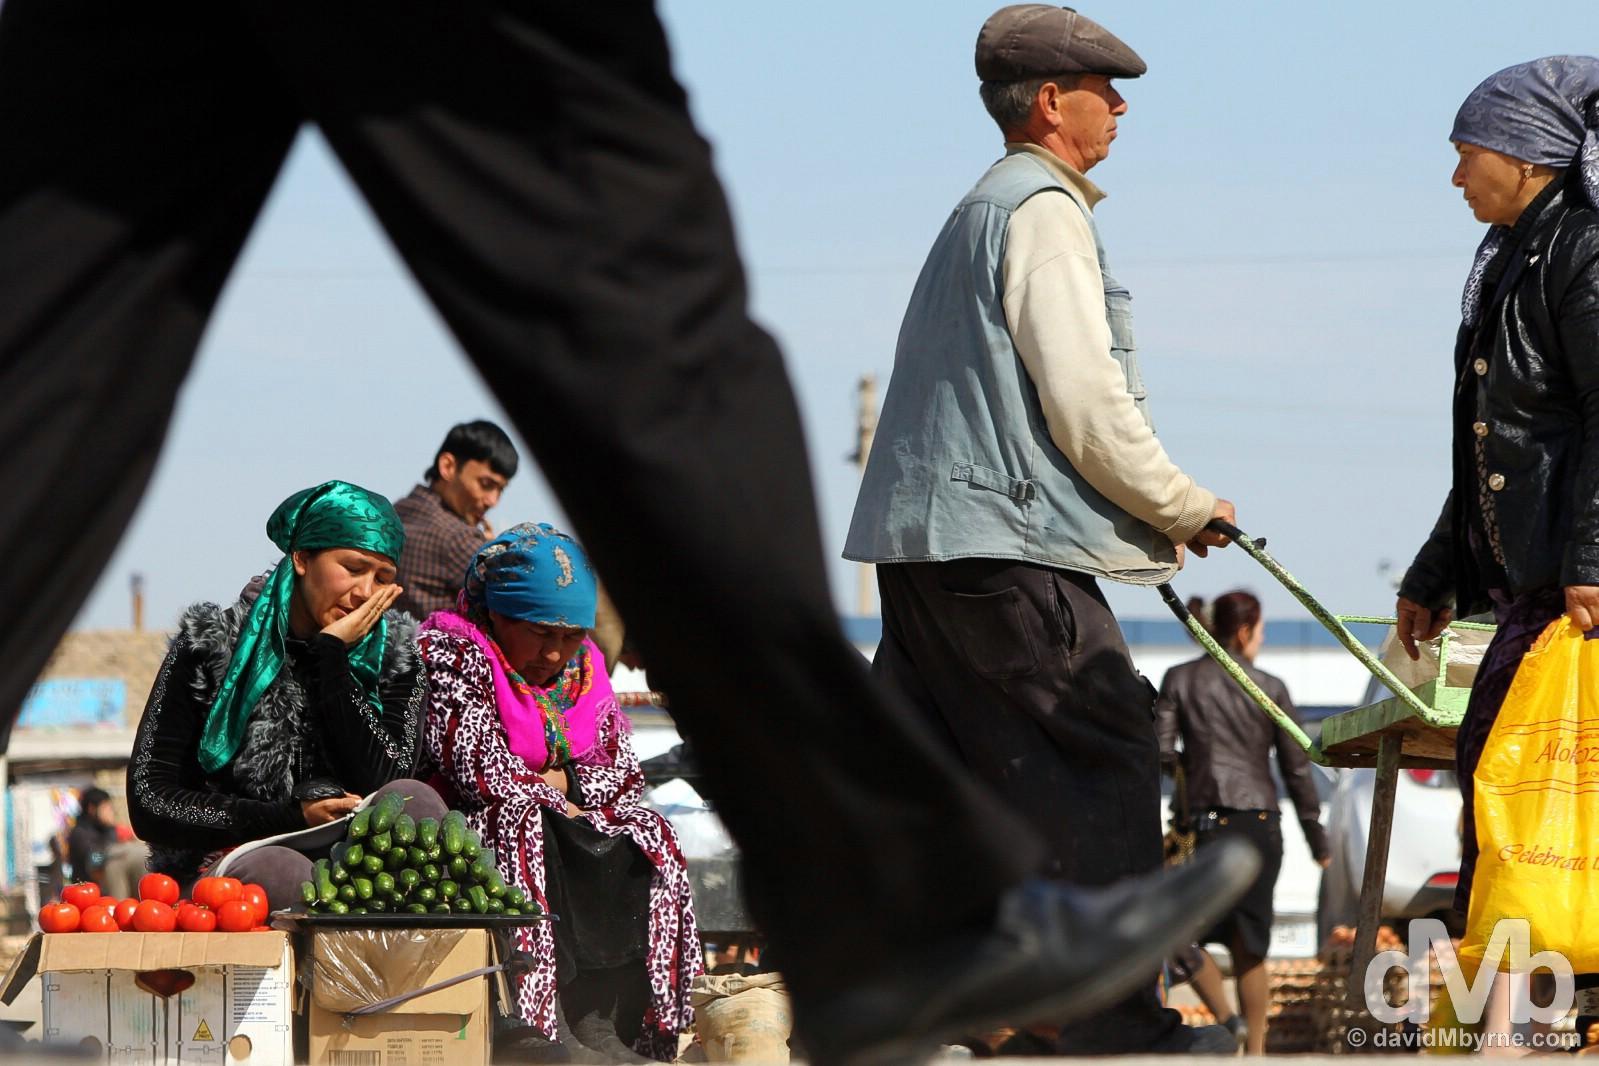 Dekhon Bazaar in Khiva, Uzbekistan. March 14, 2015.